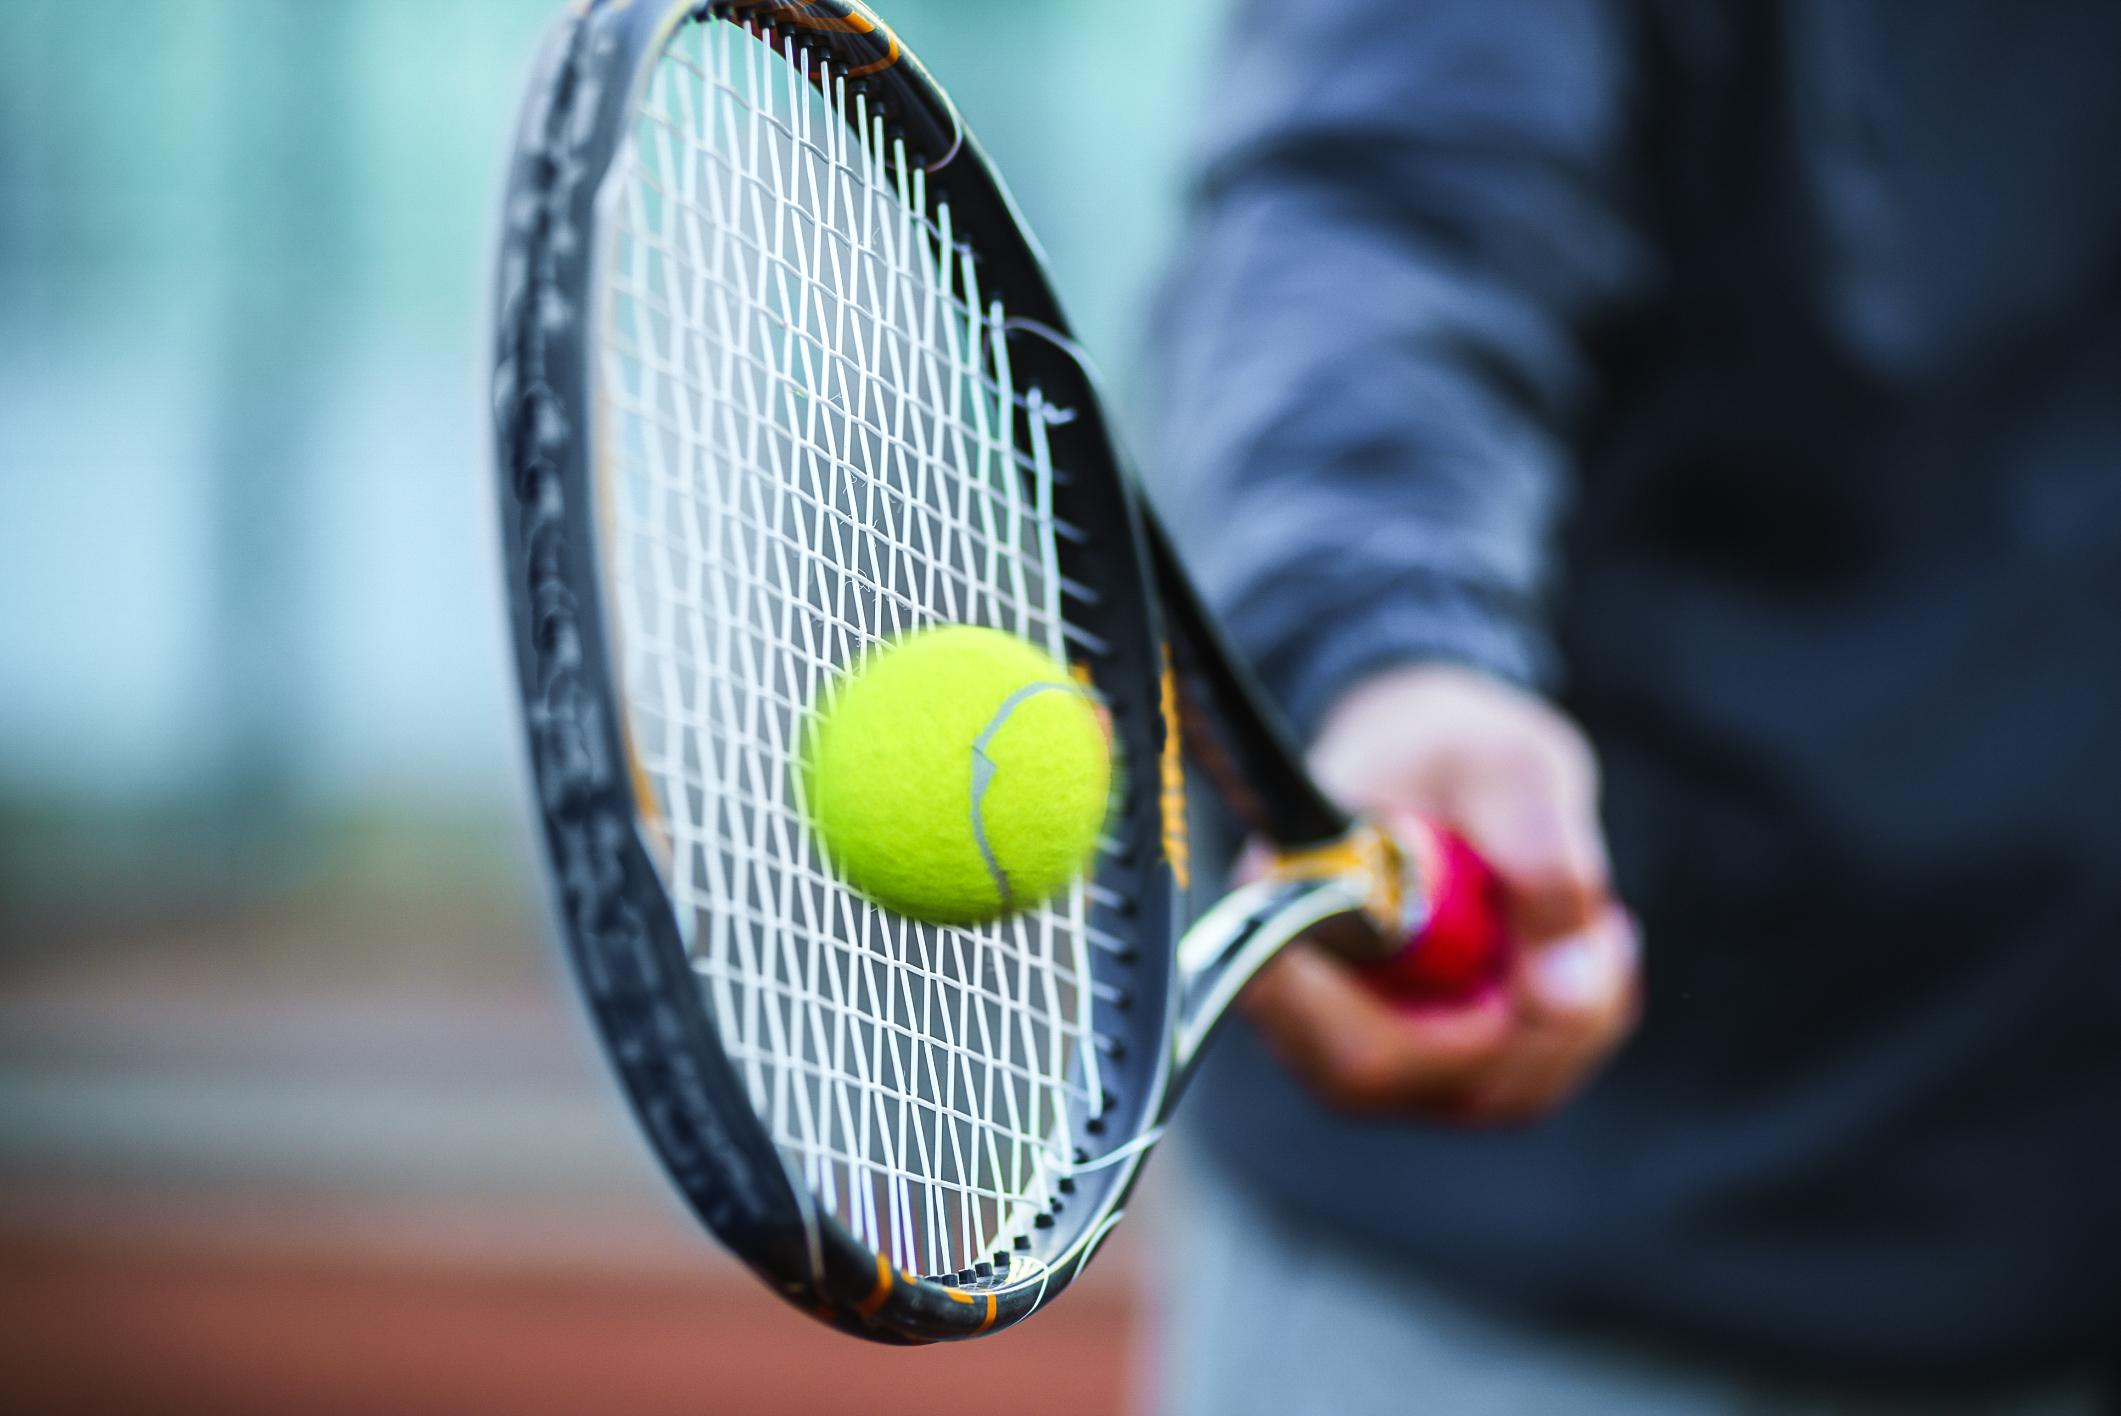 Pelham šokovala tenisová babička. Američanka porazila o 47 let mladší soupeřku